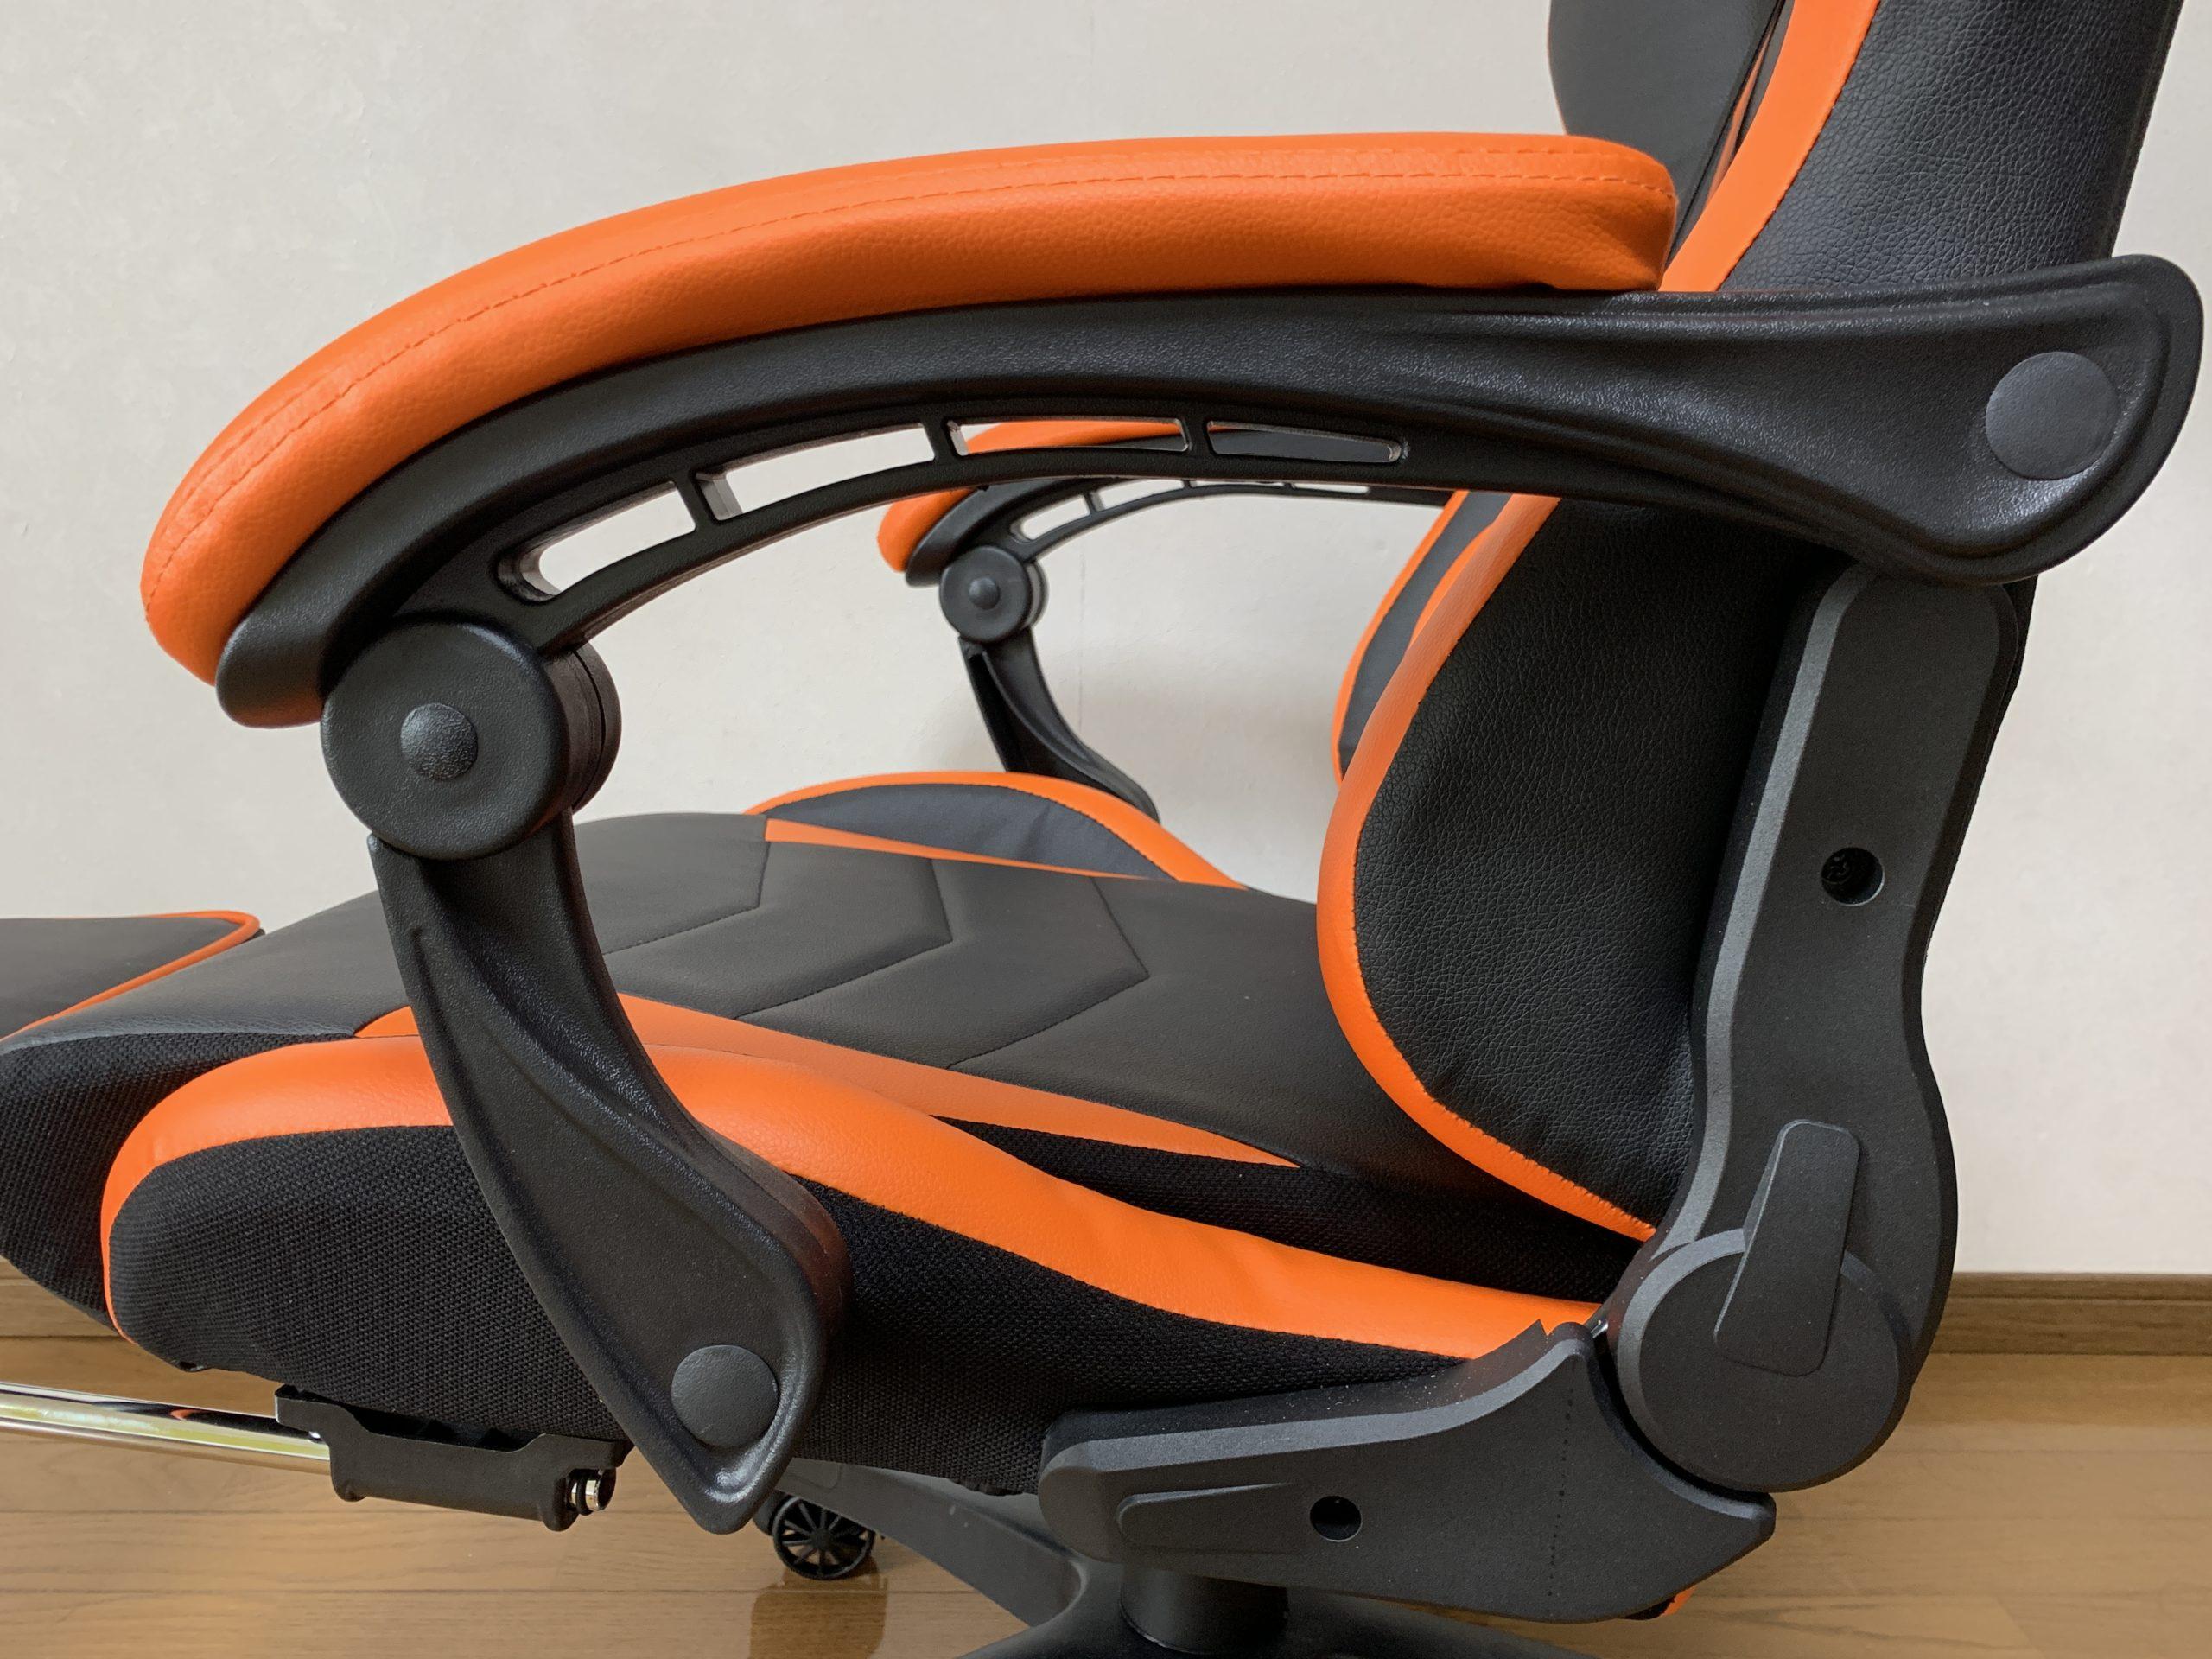 Dowinx ゲーミンチェア 肘置き クッション